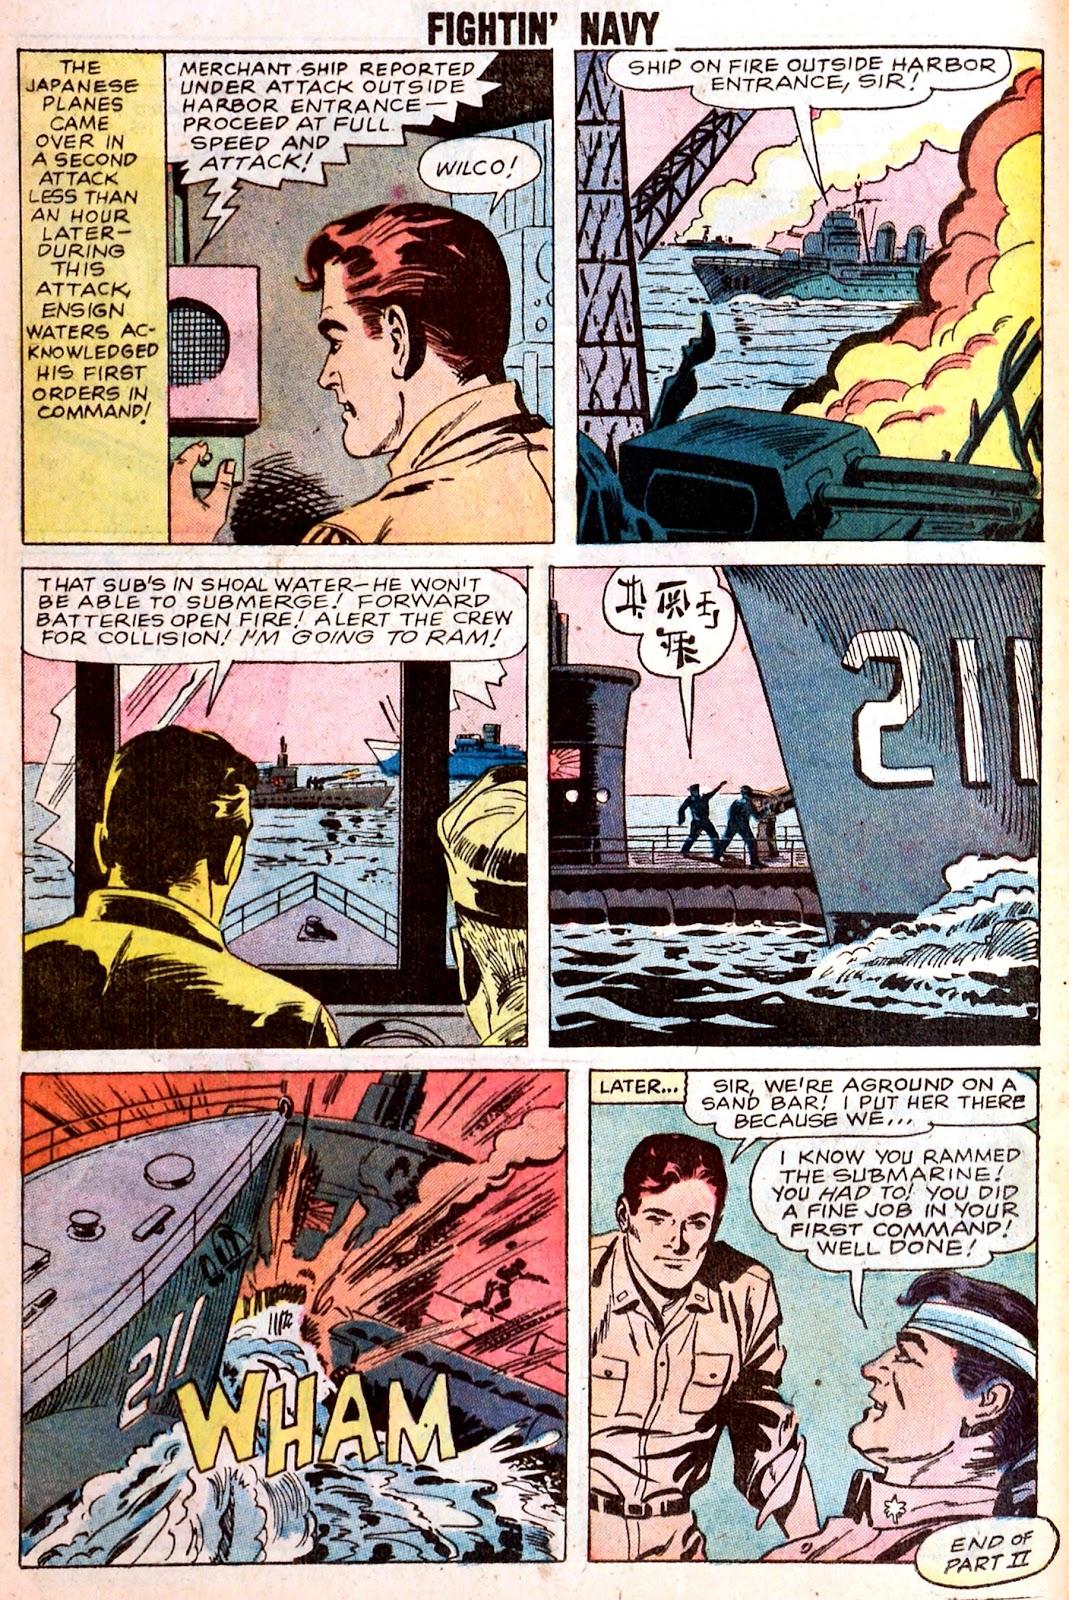 Read online Fightin' Navy comic -  Issue #85 - 12